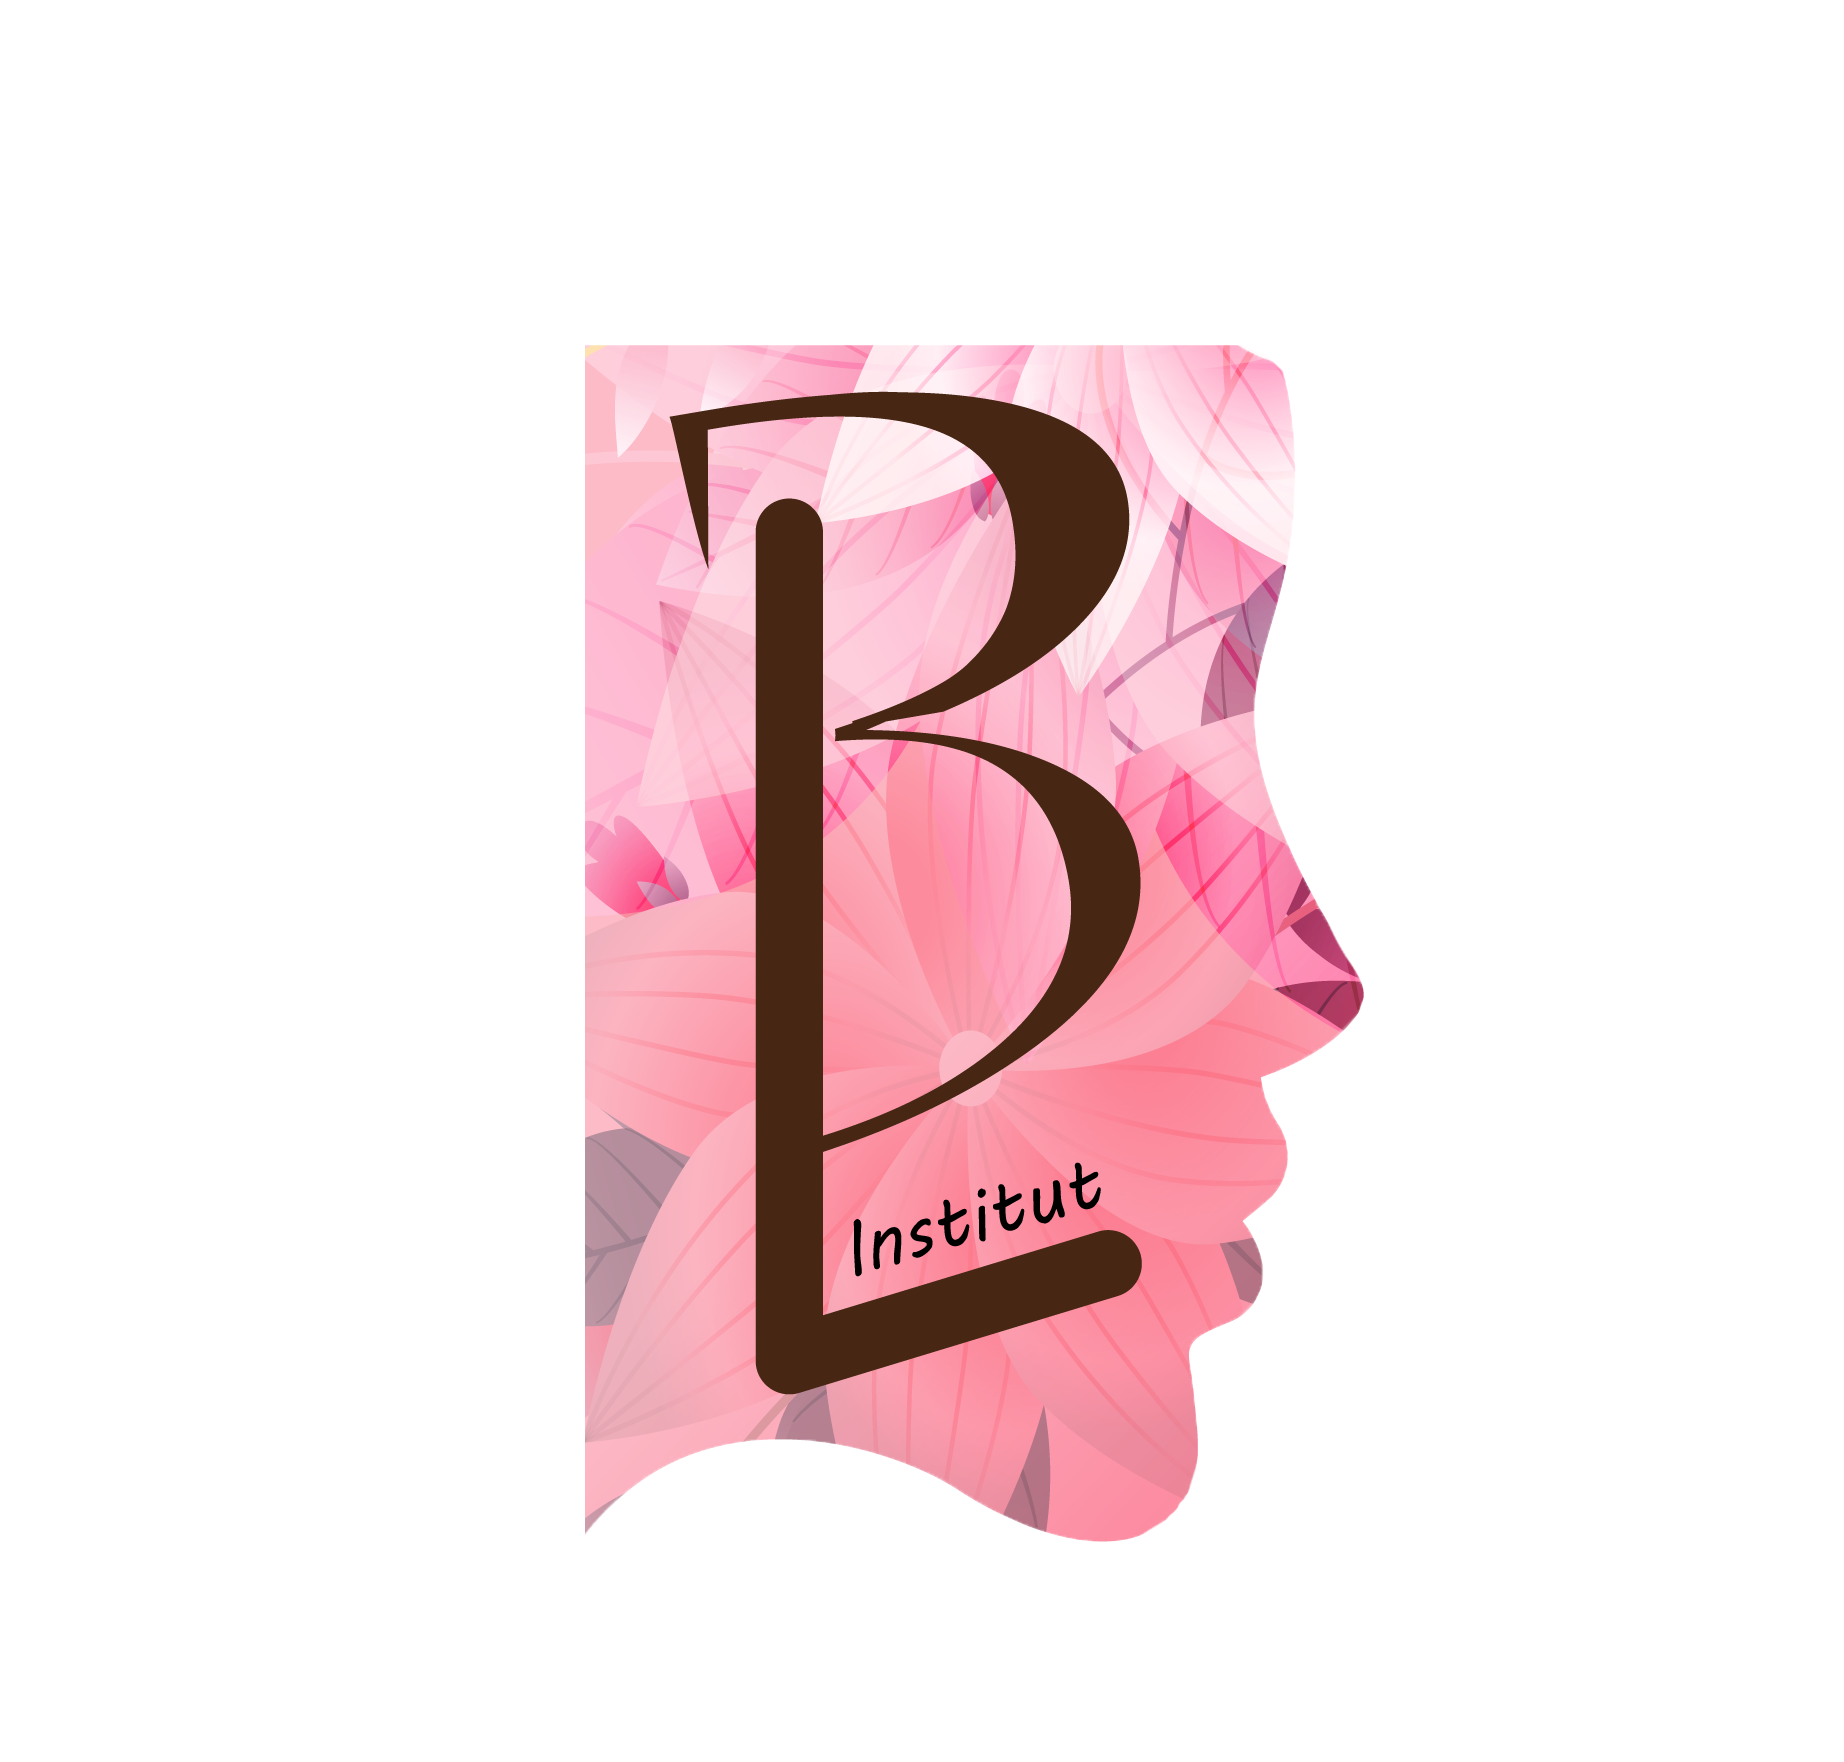 BeautyLine institut de beauté